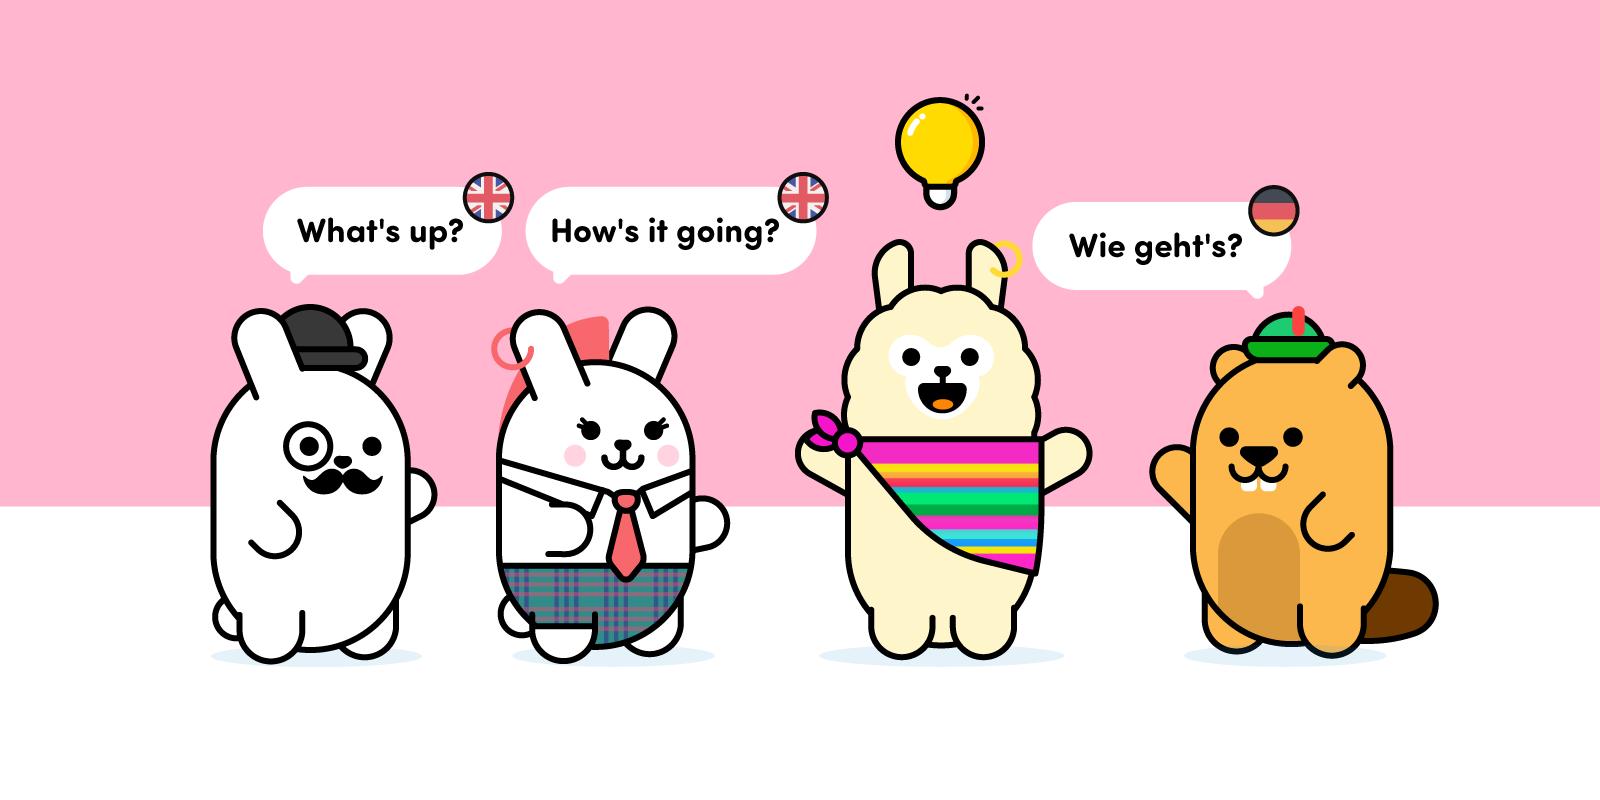 Bunny dice hello